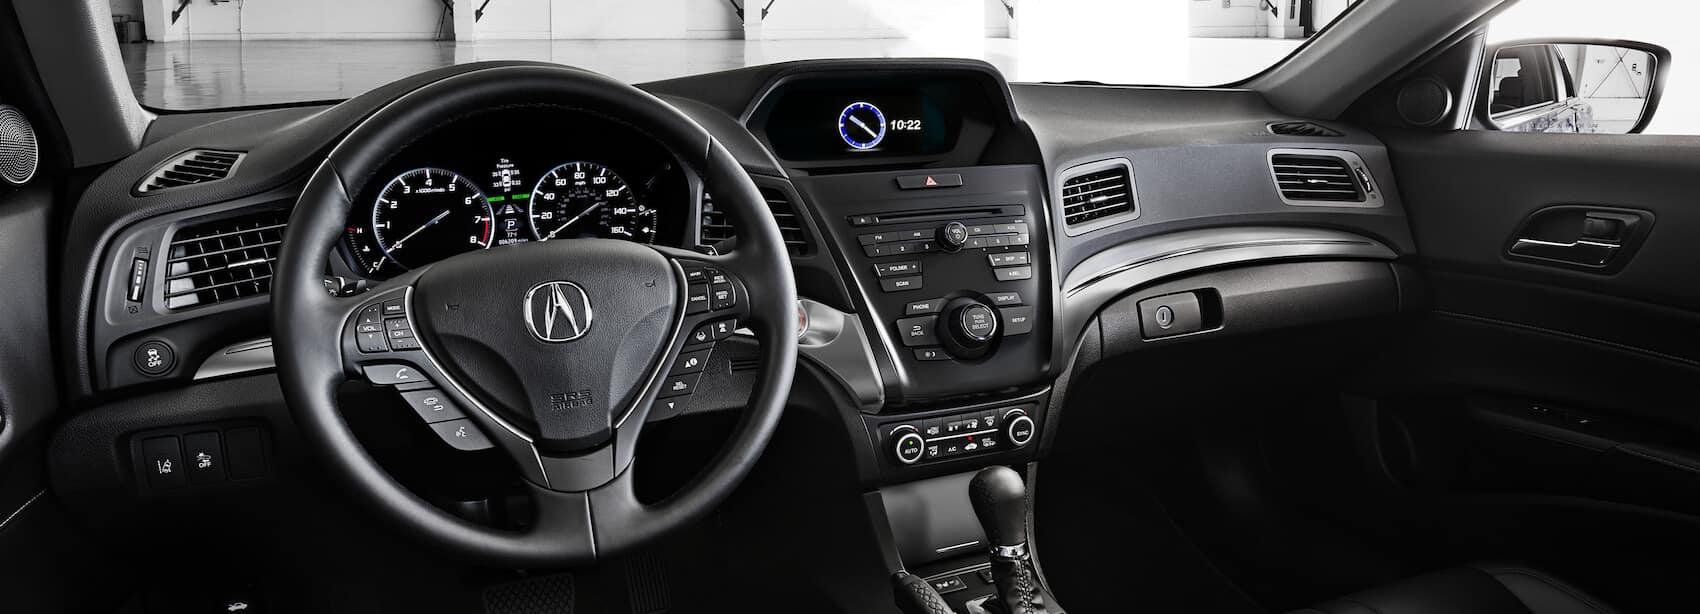 Acura ILX interior technologies